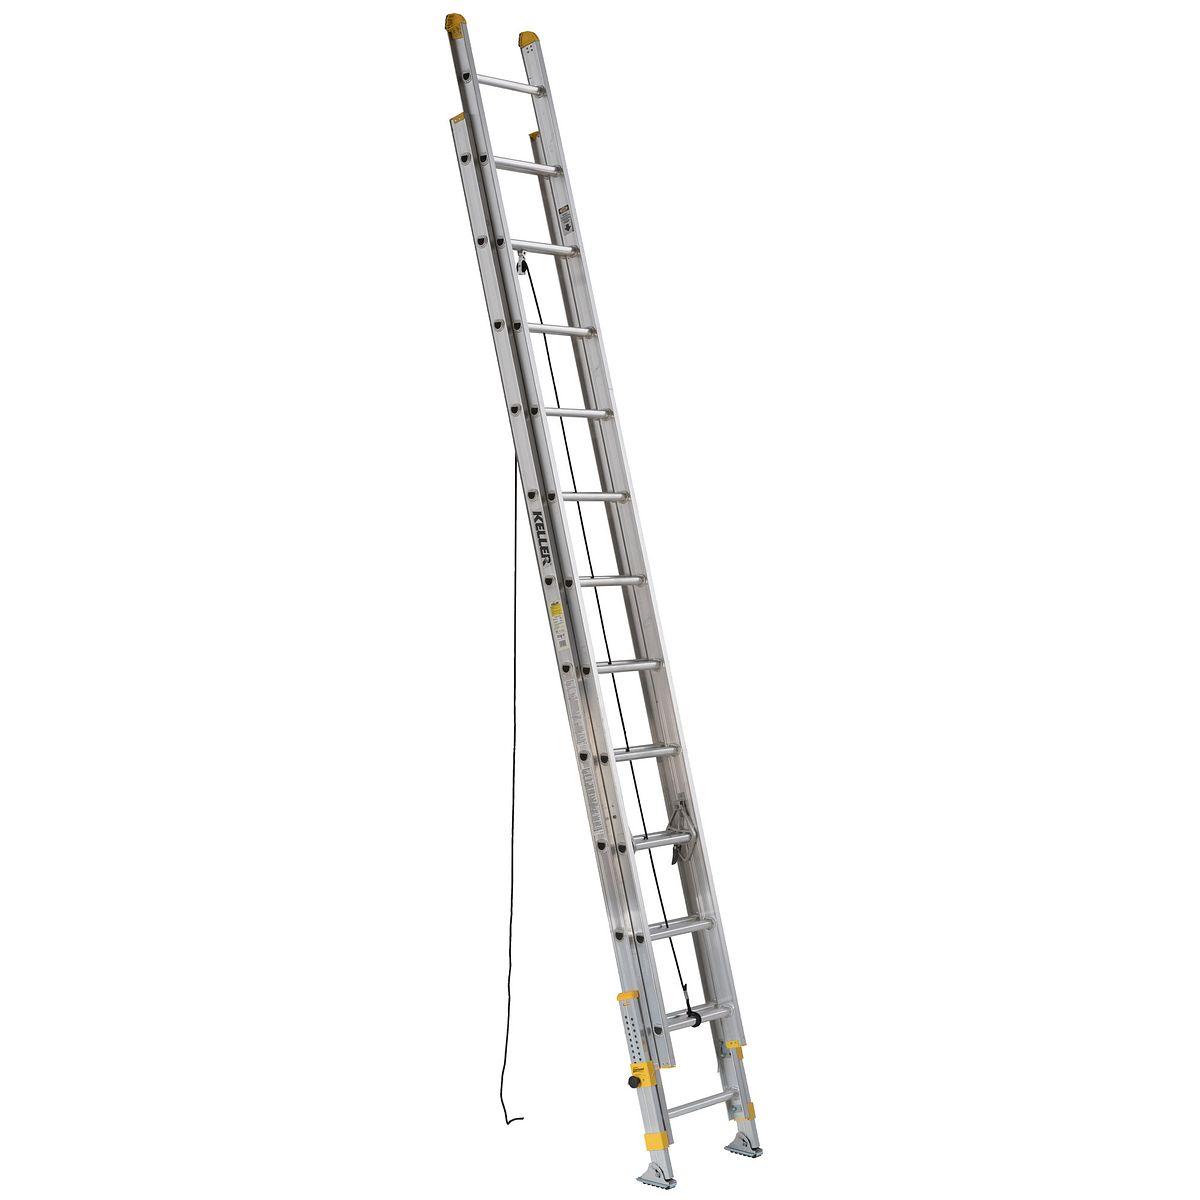 3524 At Extension Ladders Keller Us